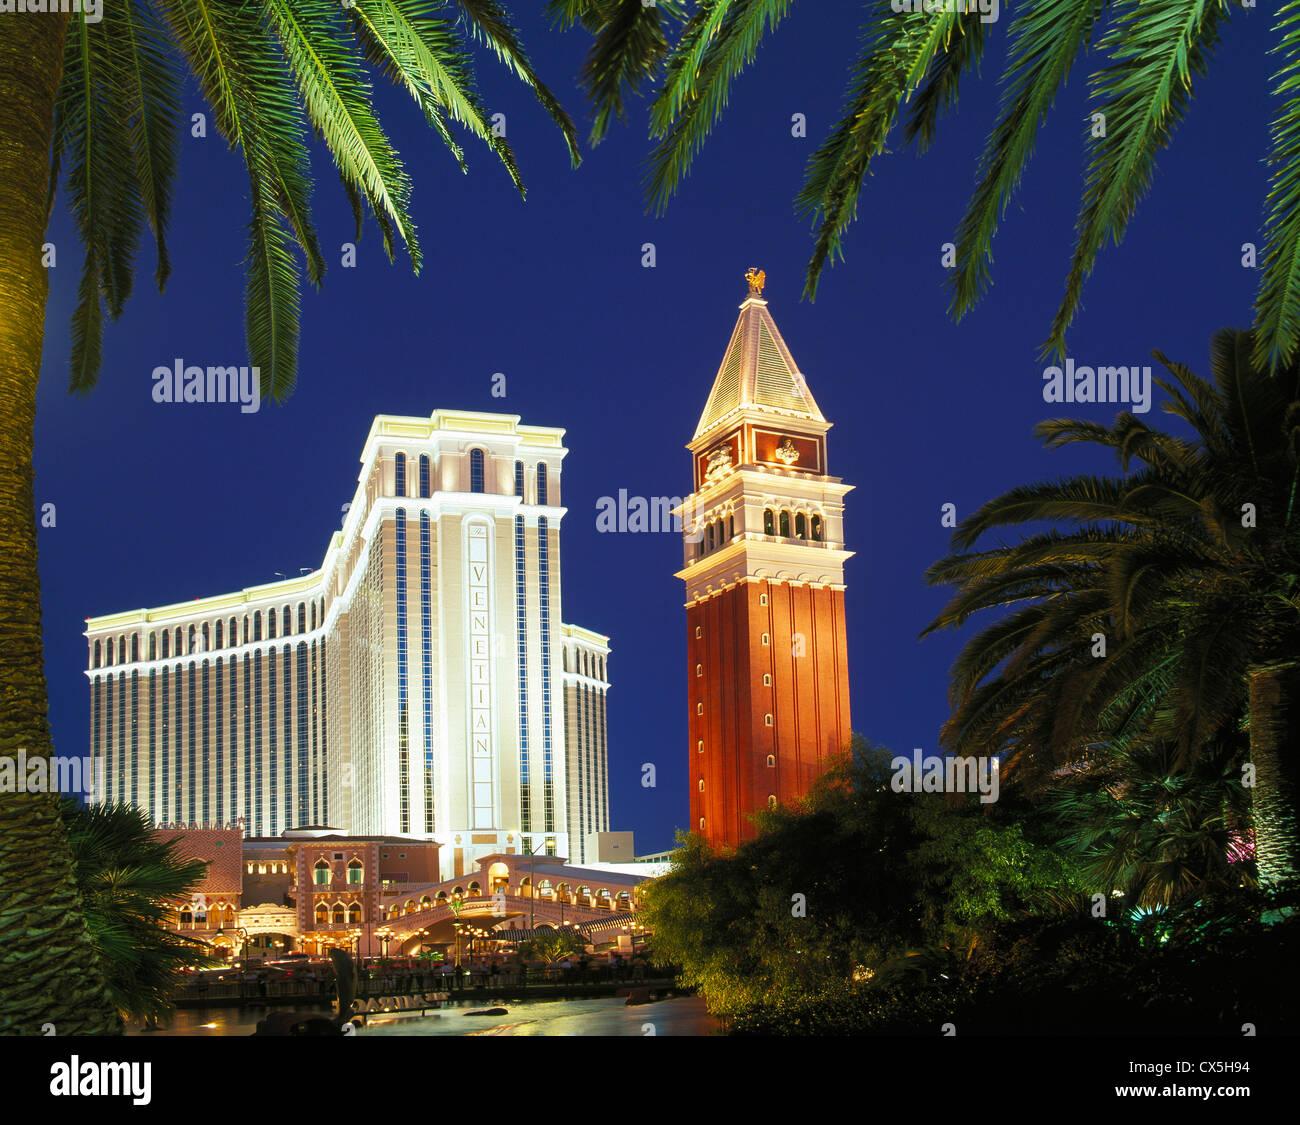 Das Venetian Hotel and Casino, Las Vegas, Nevada, USA Stockbild